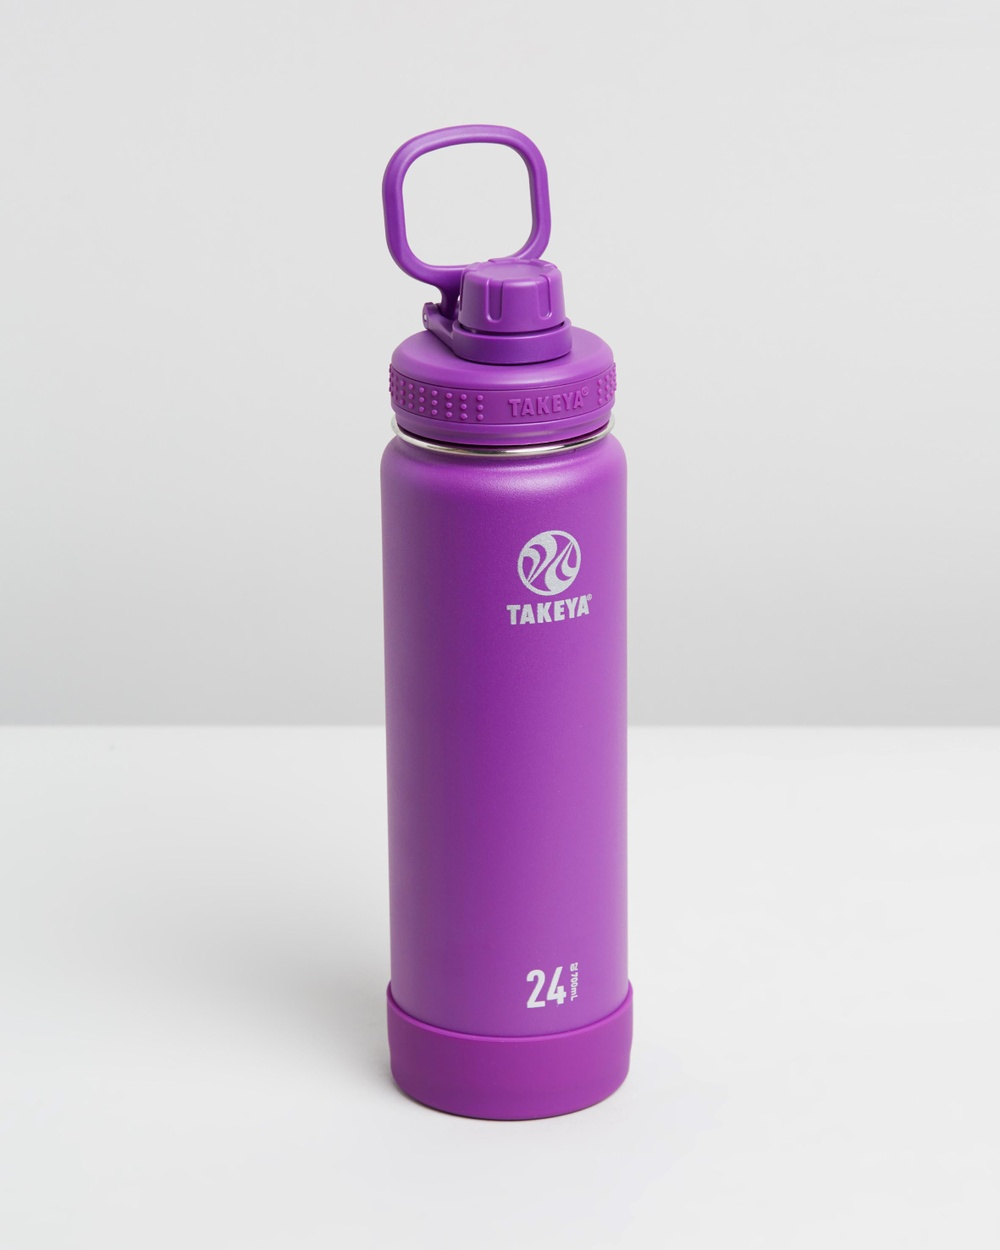 TAKEYA 700ml Insulated Stainless Steel Bottle 24oz Water Bottles Violet